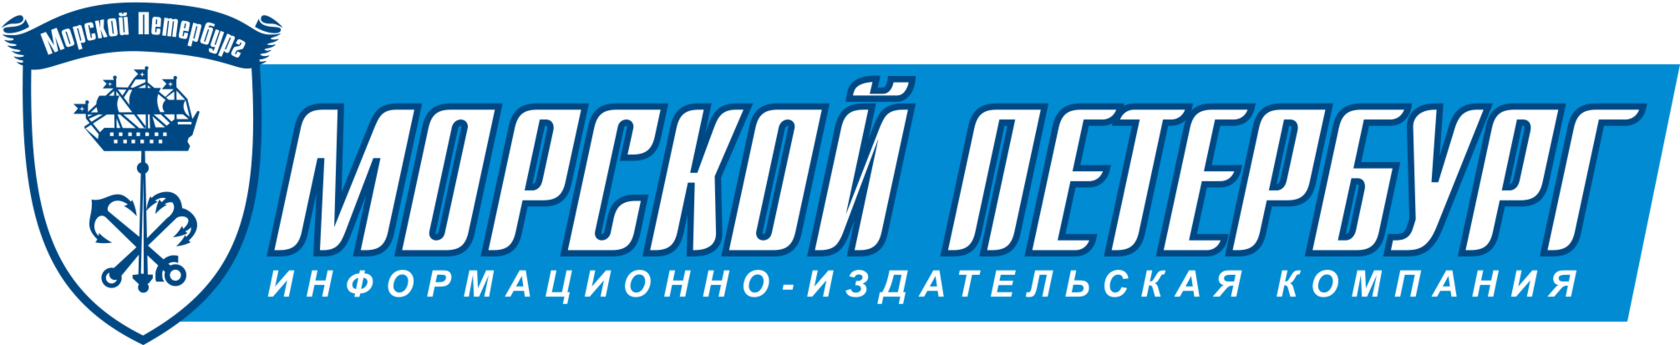 "ООО ""Морской Петербург"""